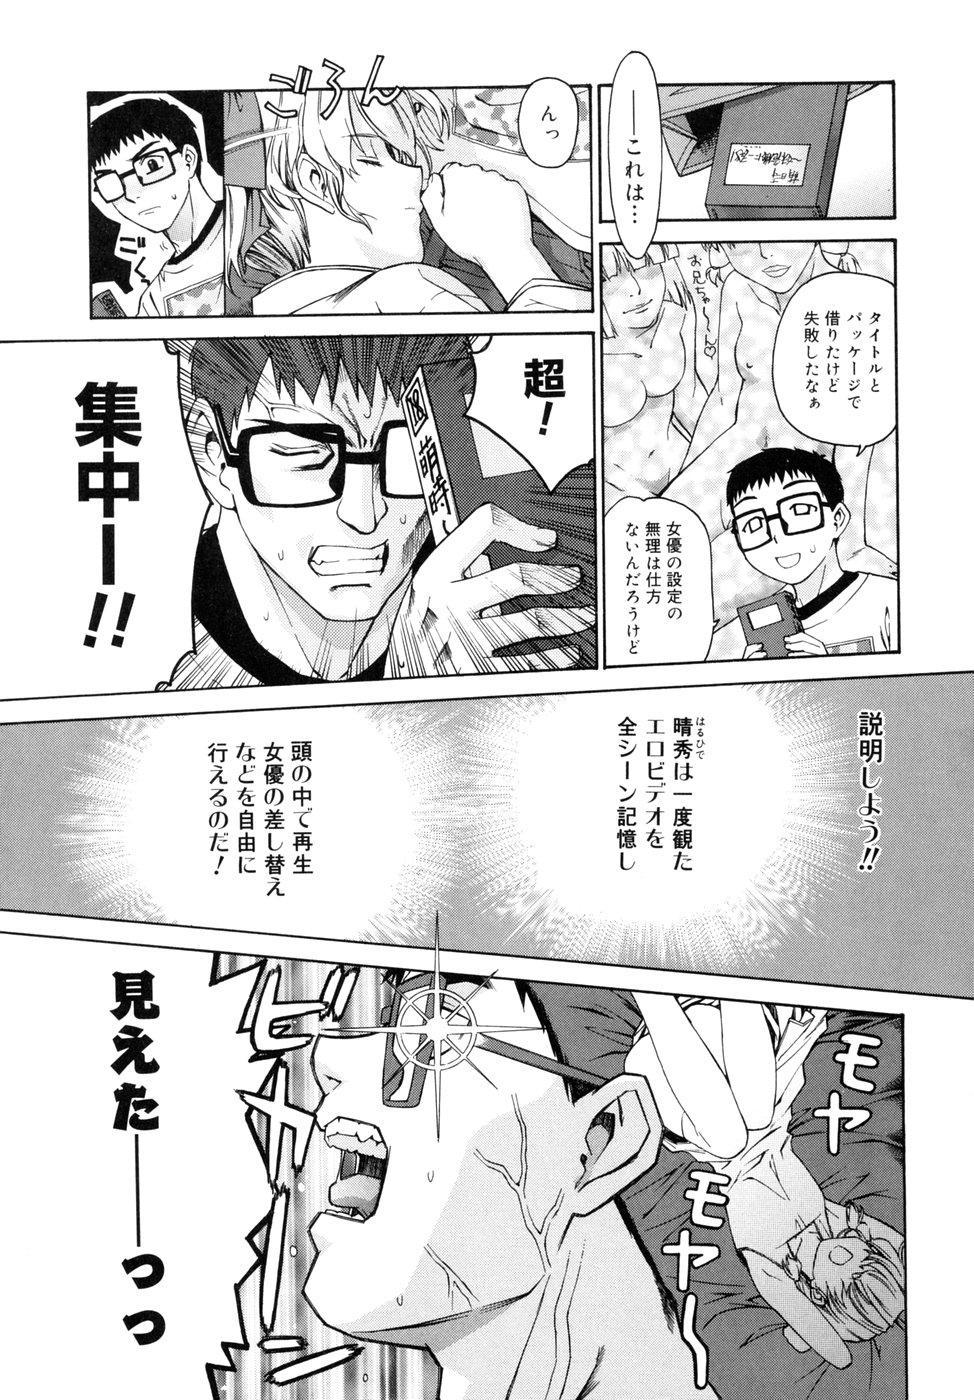 [Yaya Hinata] Tonari no Miko-san wa Minna Warau - The next shrine maidens smile in everyone. 126